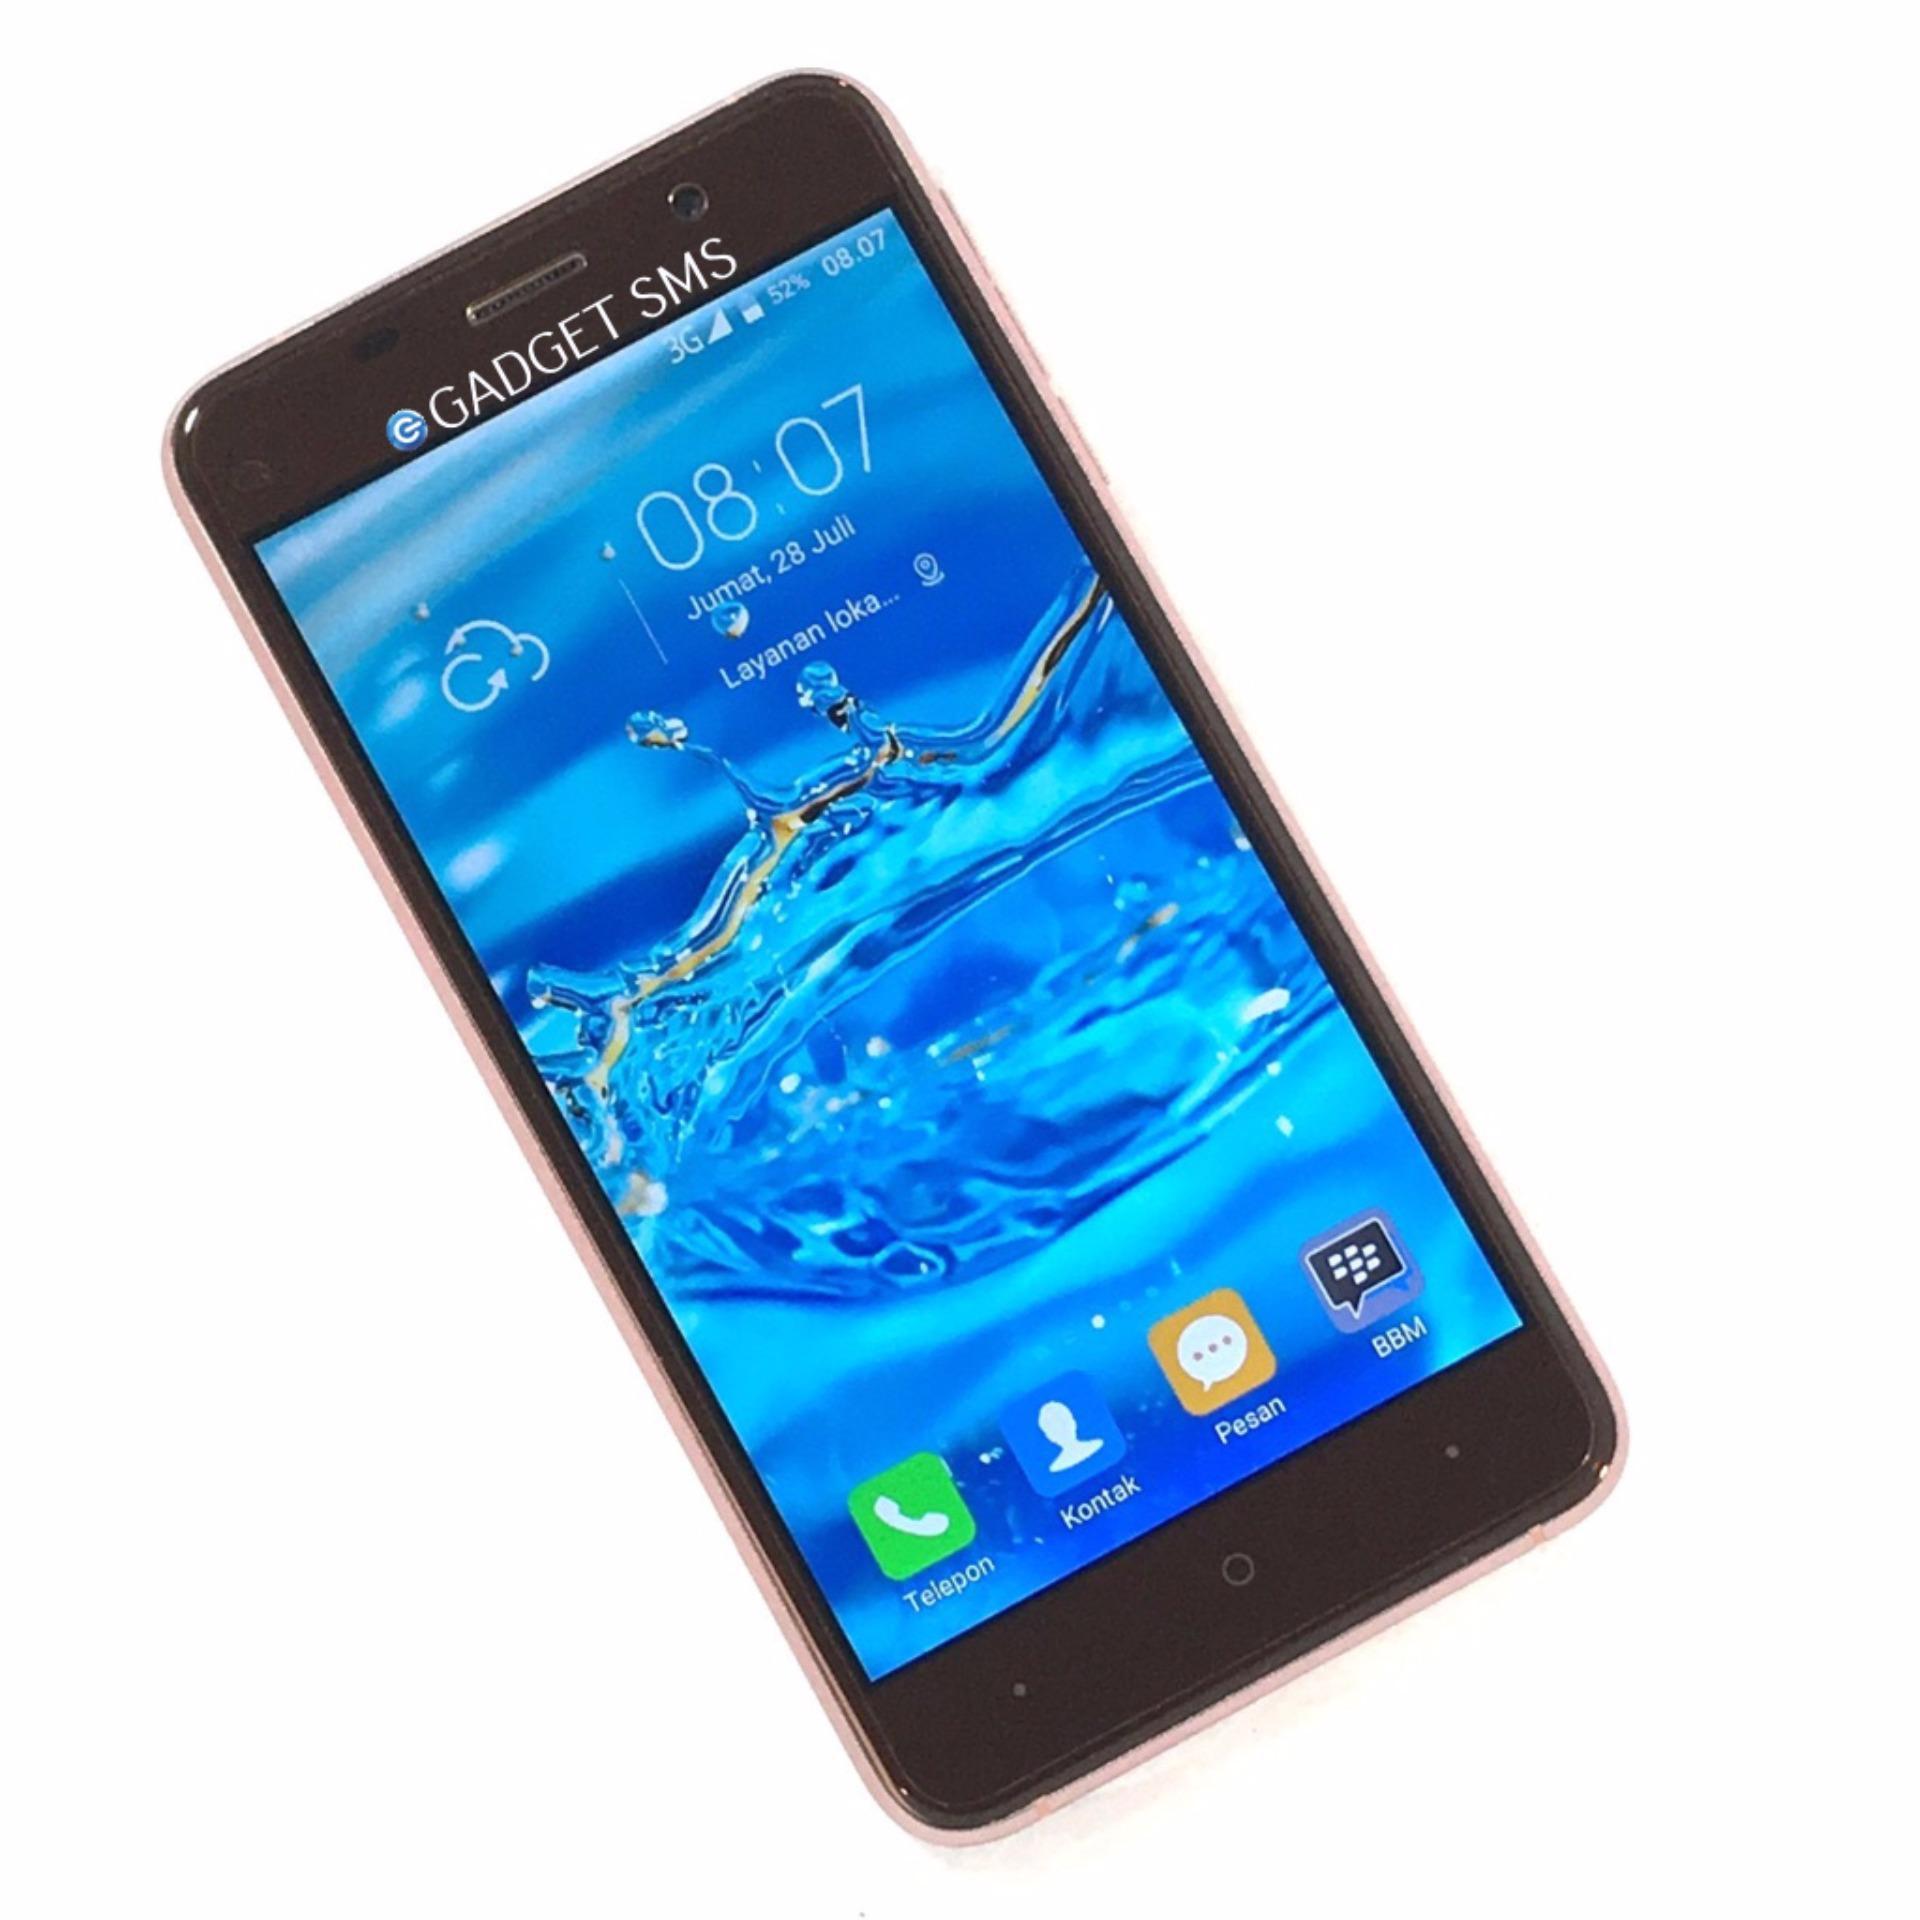 Daftar Harga Mito A39 Fantasy Lte Ram 1gb Rom 8gb 5 Pencarian Samsung Galaxy V2 J106 Putih